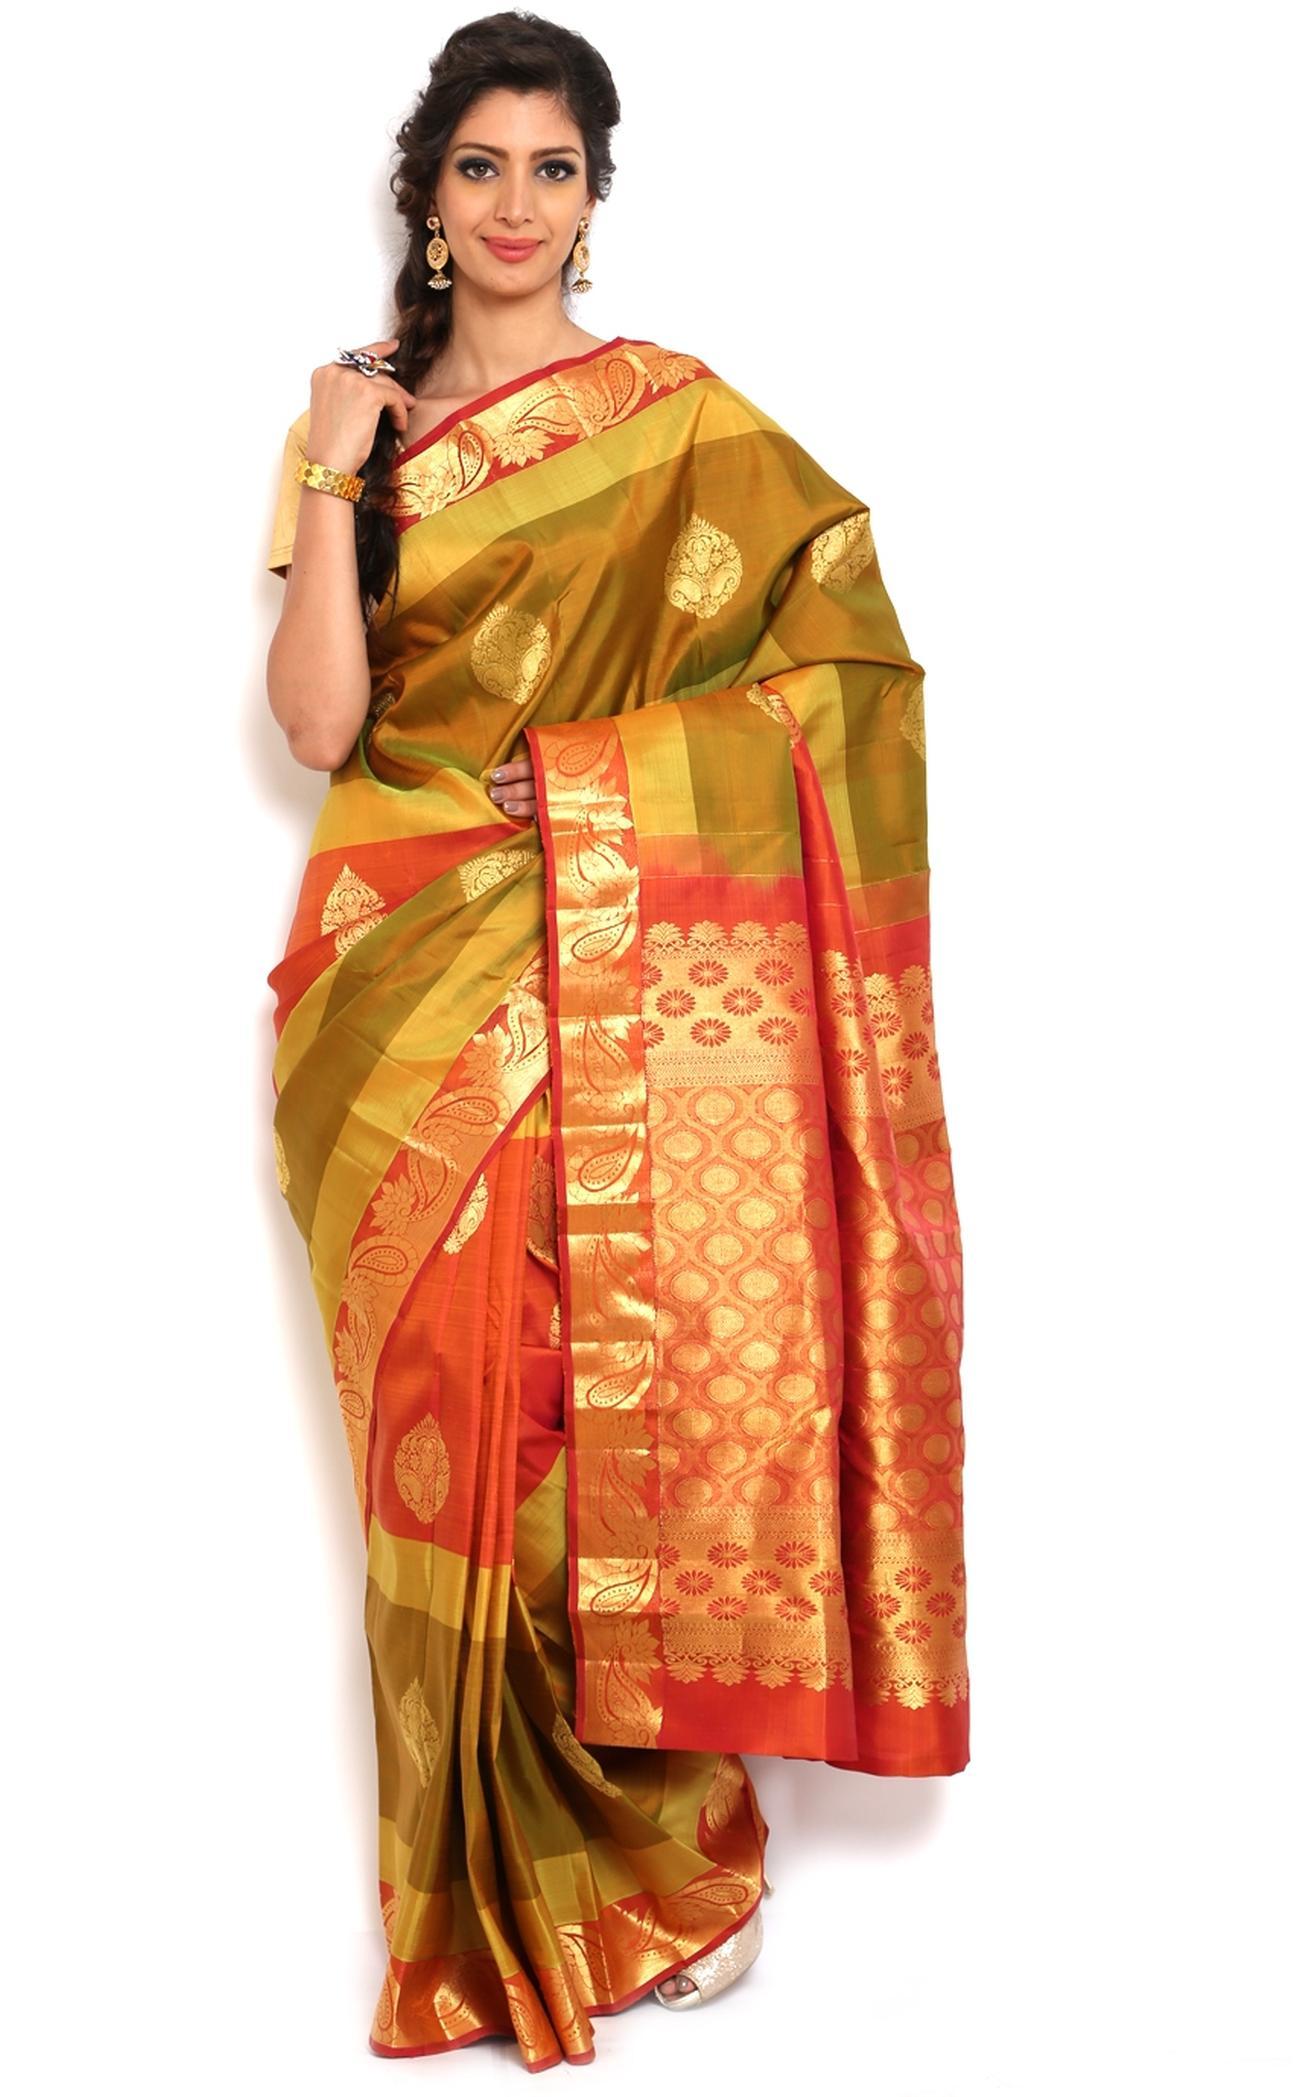 1fefa498e0 Sudarshan silks Kancheepuram Pure Silk Saree-Green-Silk-GBLM8-VP - Sudarshan  Family Store - 214021